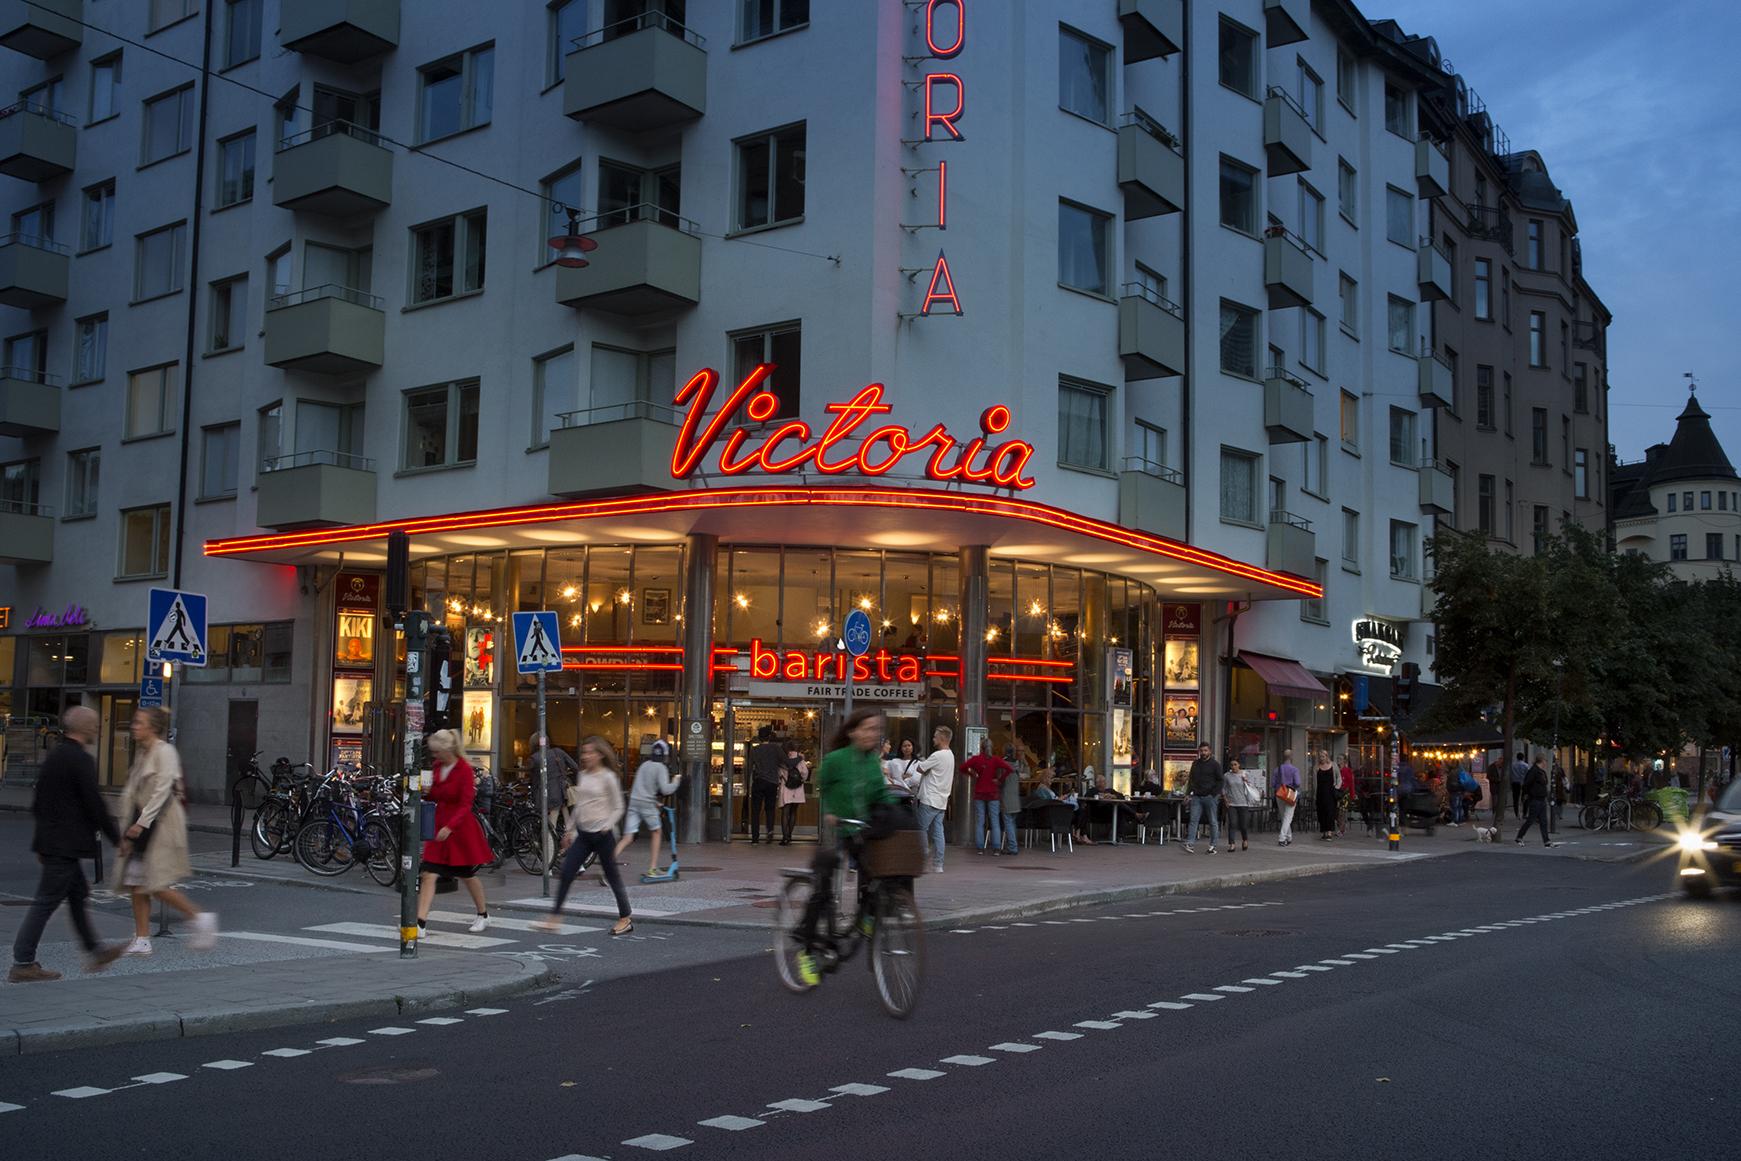 Club Victoria Stockholm